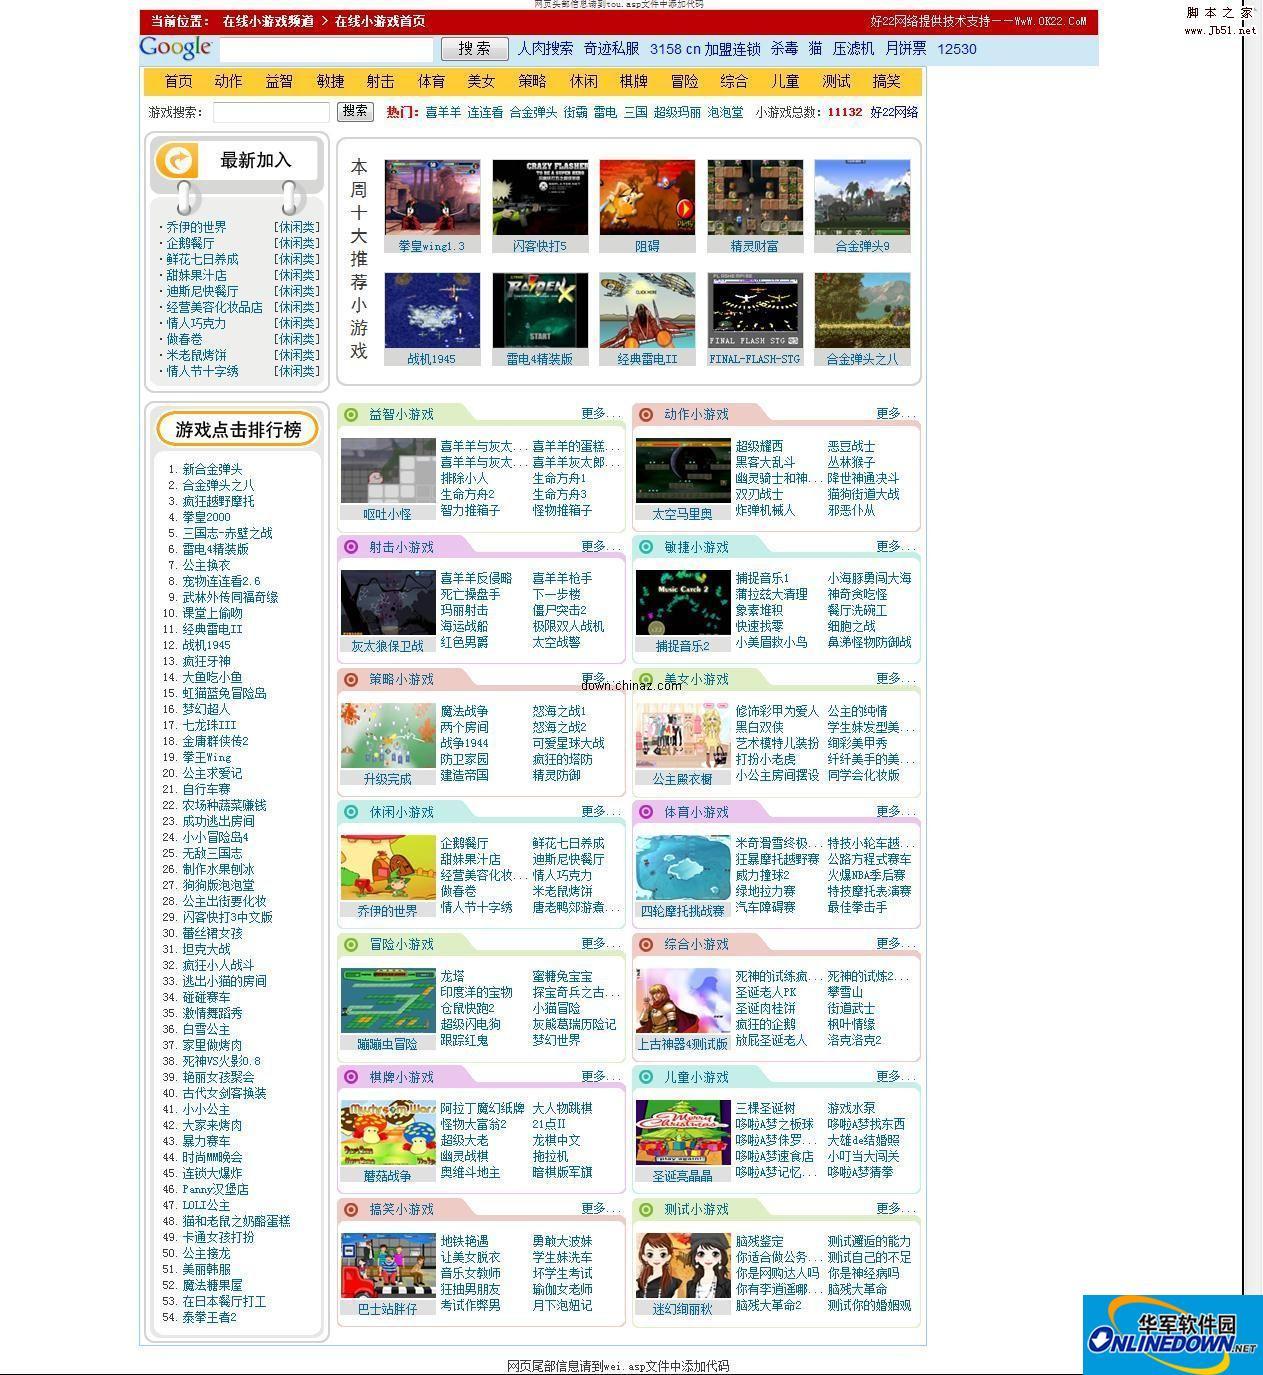 asp 好22网络在线小游戏小偷 PC版